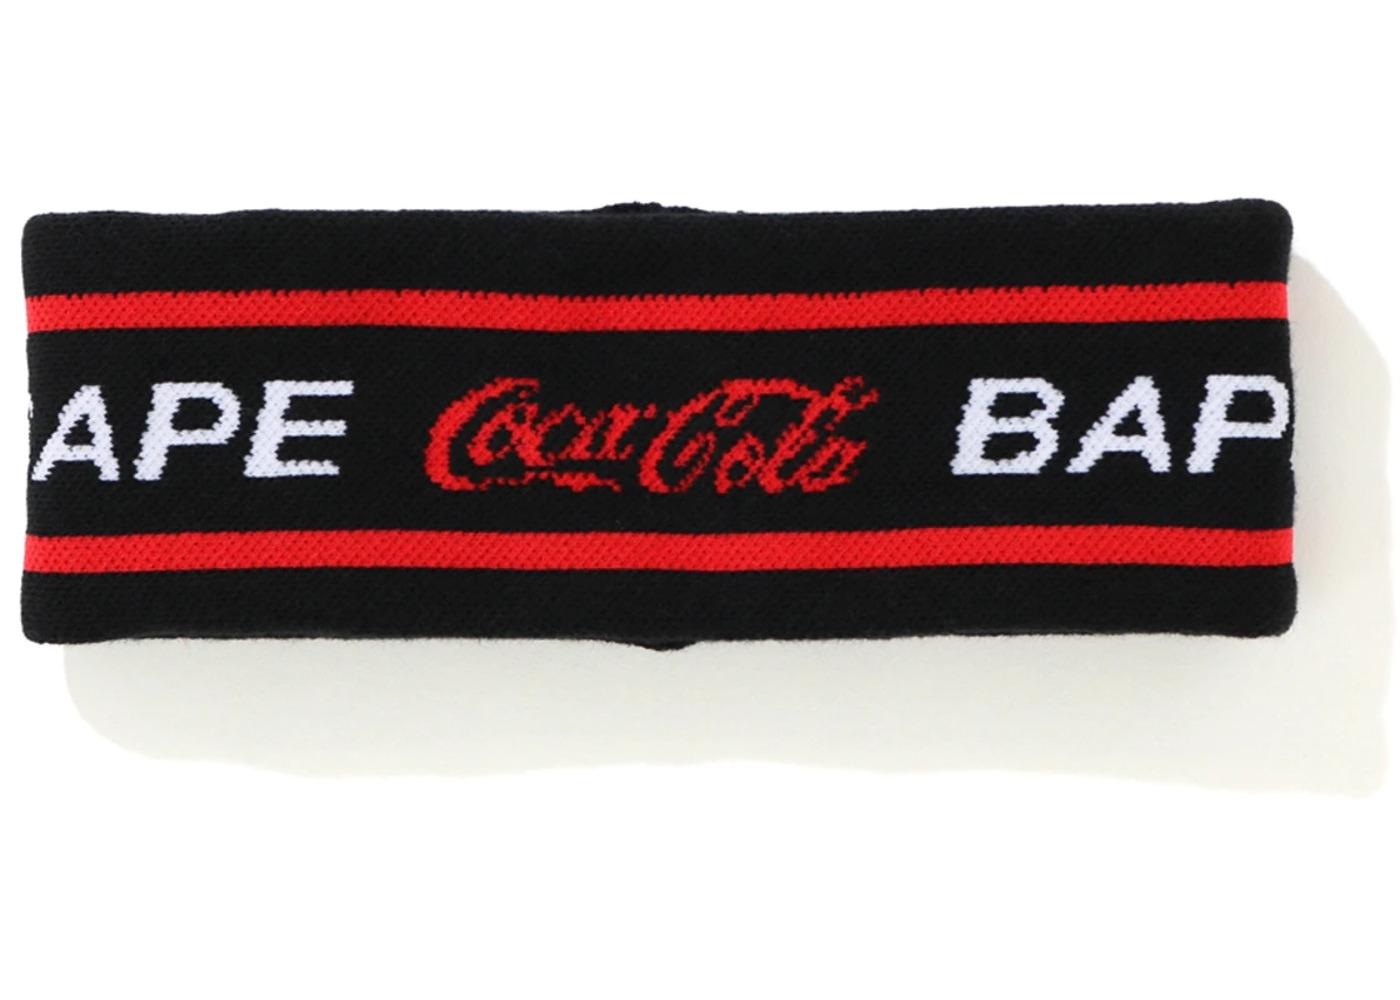 Bape x Coca Cola Headband Black (SS20)の写真